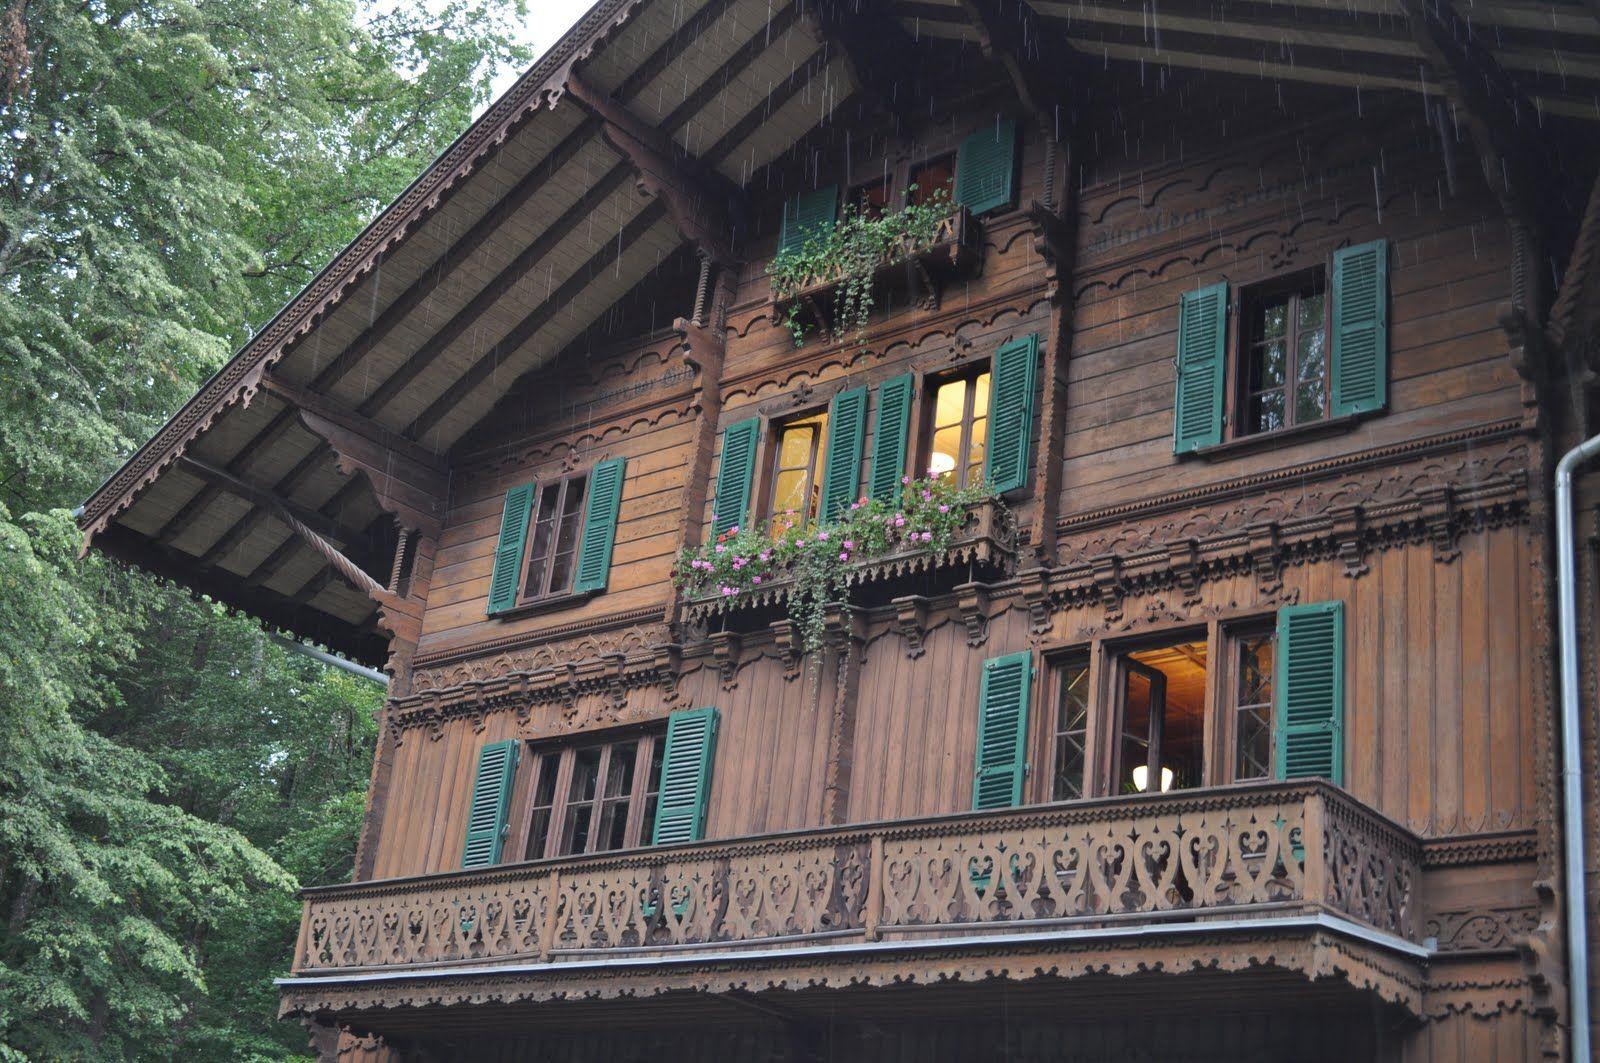 Willow Decor The Swiss Chalets Of Ballenberg Swiss Chalet German Houses Ski House Decor